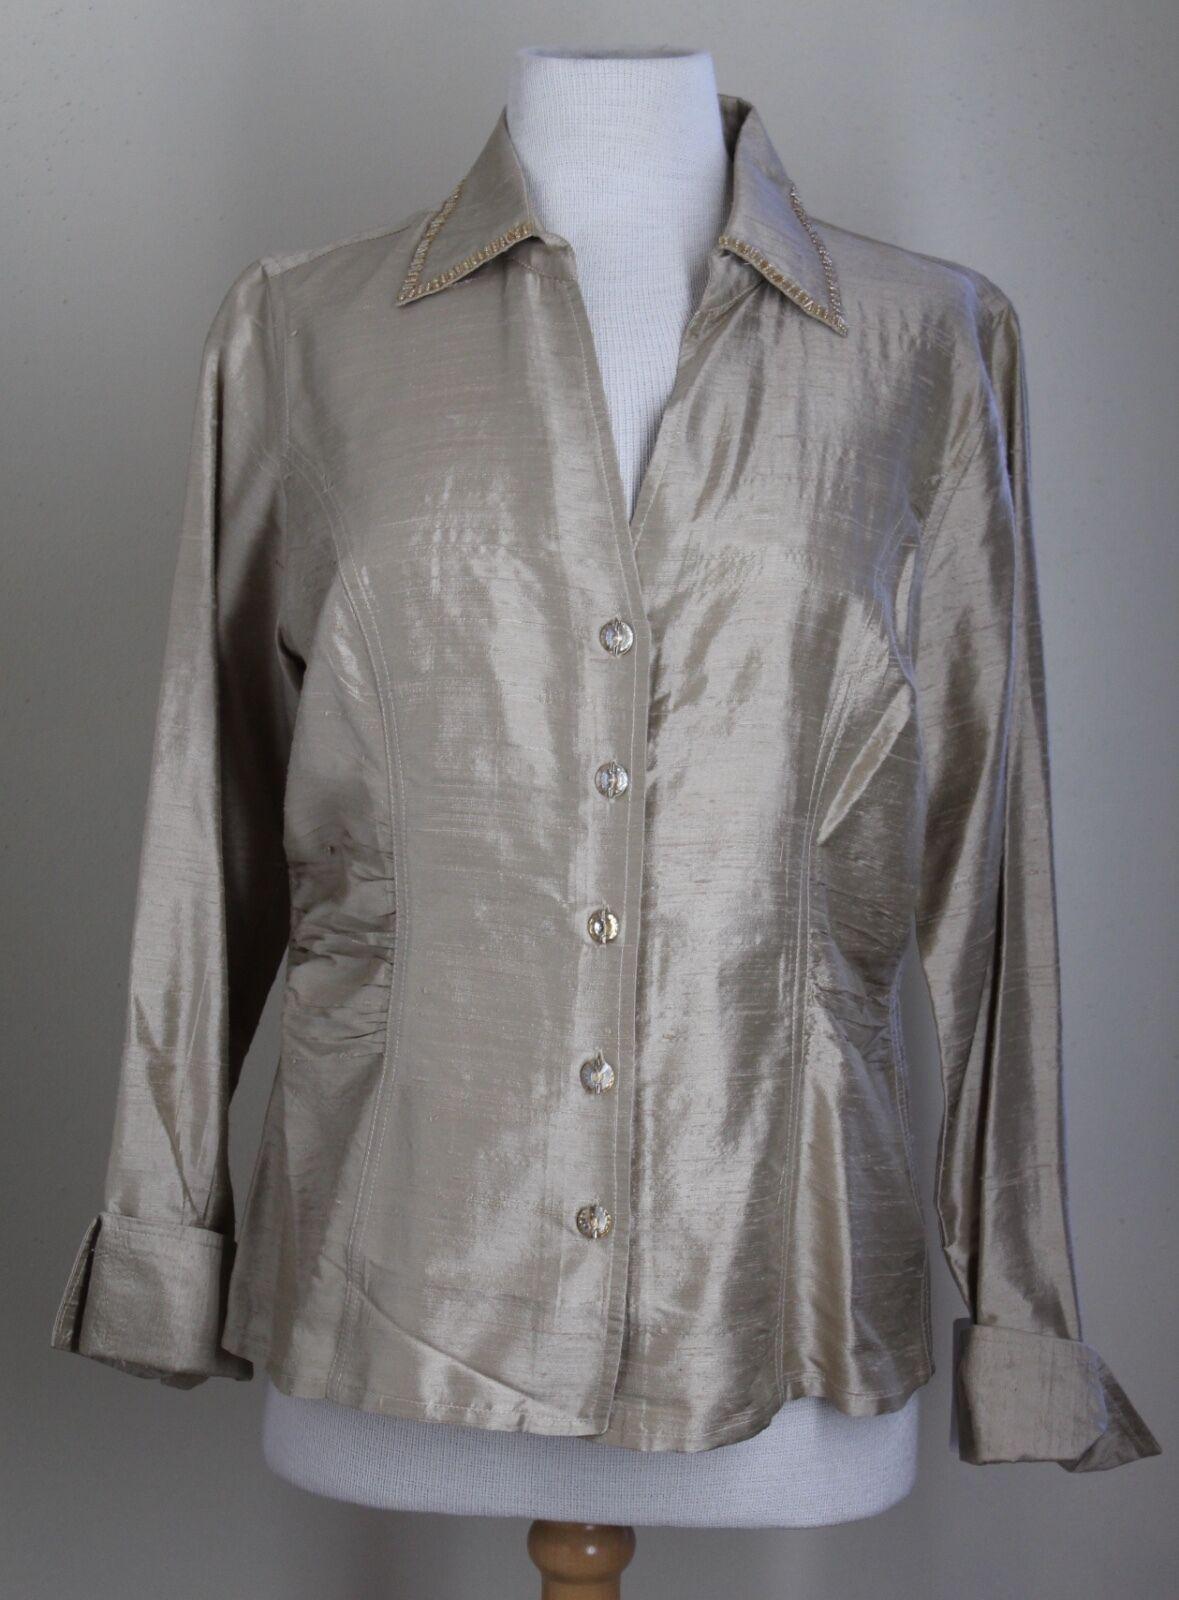 New Blau Bayou Art-to-Wear Gold Champagne Silk Ruched Shirt Jacket Sz M